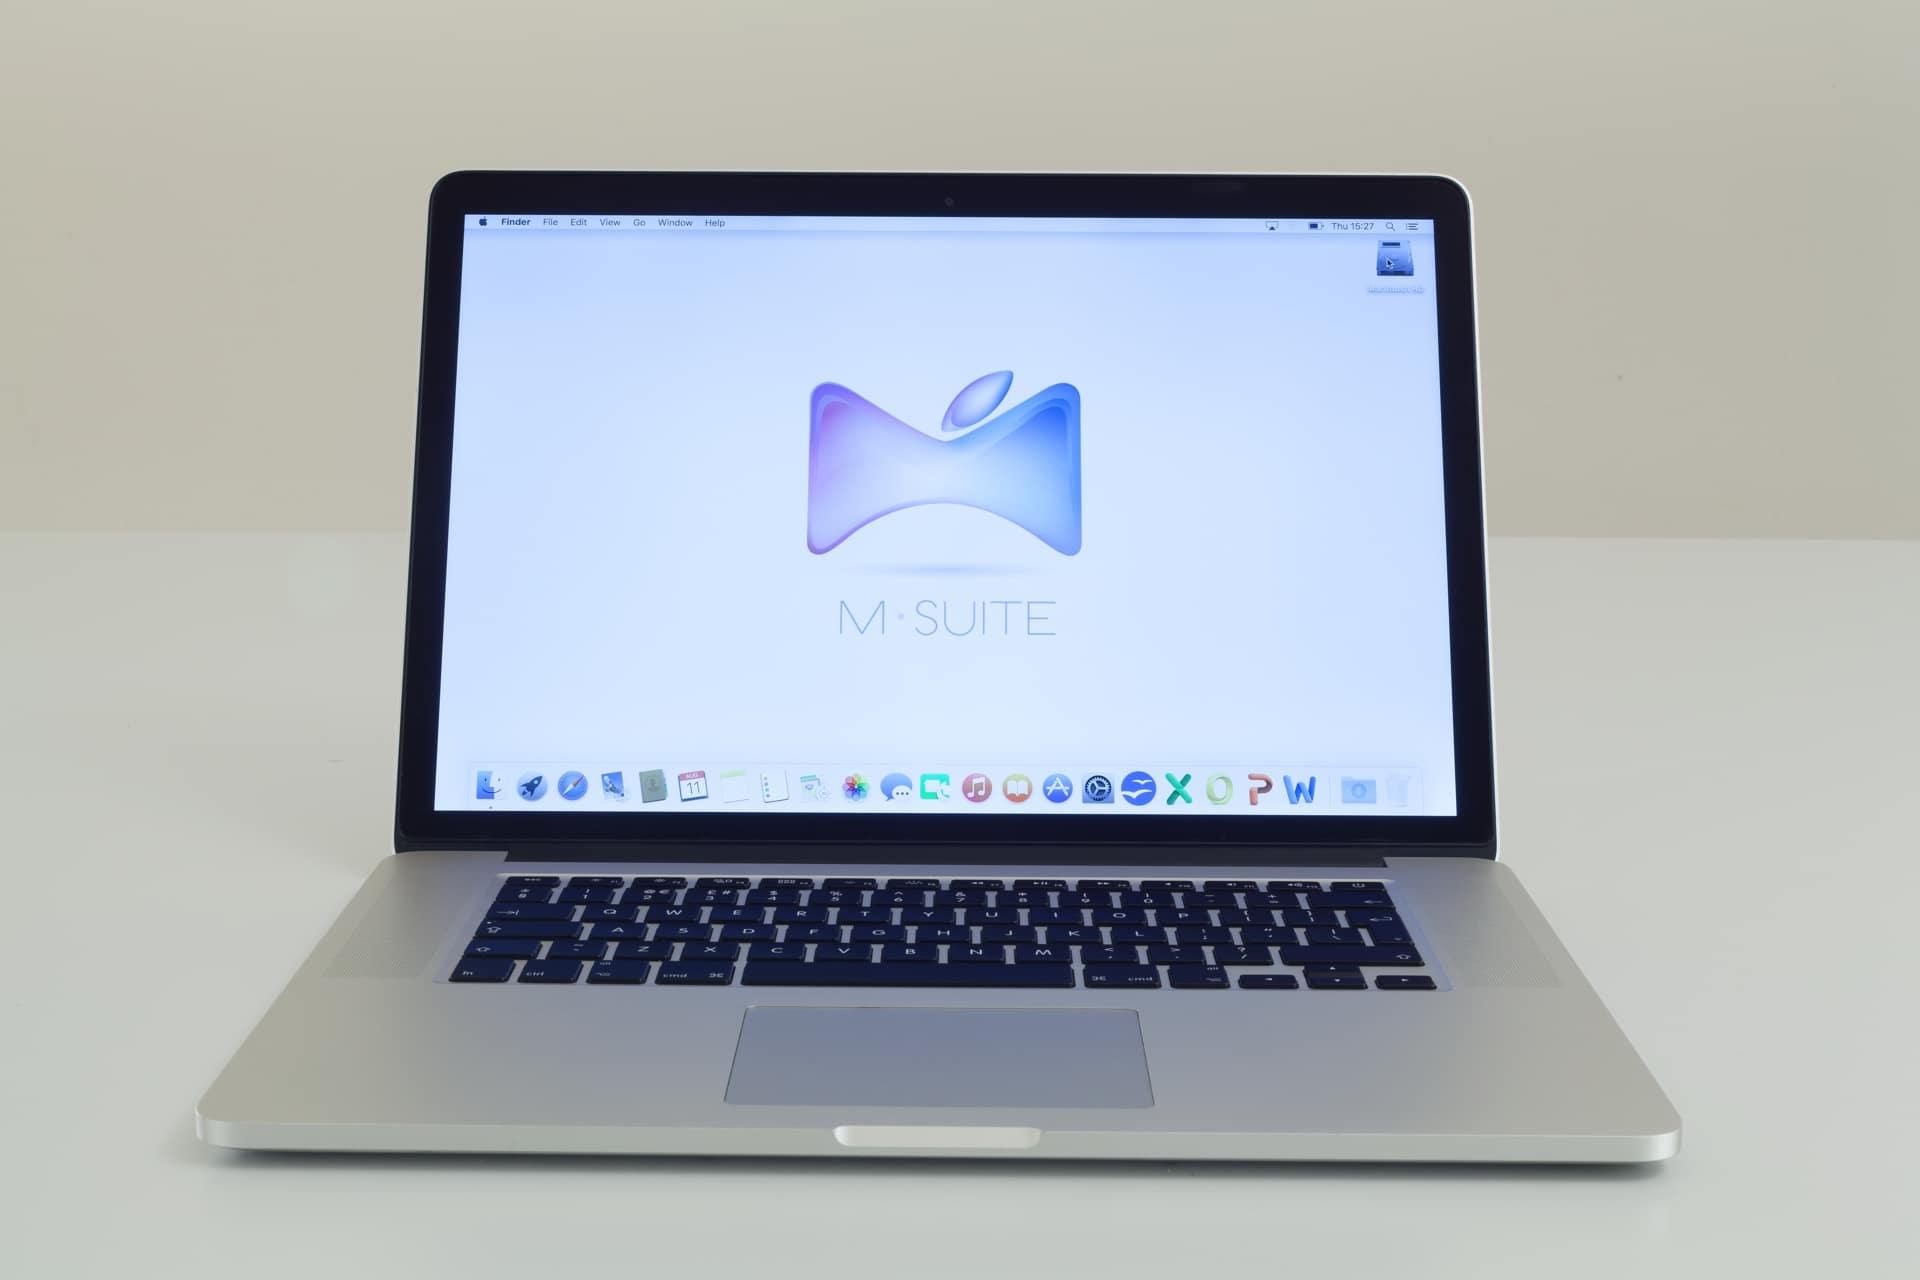 Apple macbook pro retina 15 inch 2 2ghz core i7 mid 2015 m suite - Macbook pro 15 retina ports ...